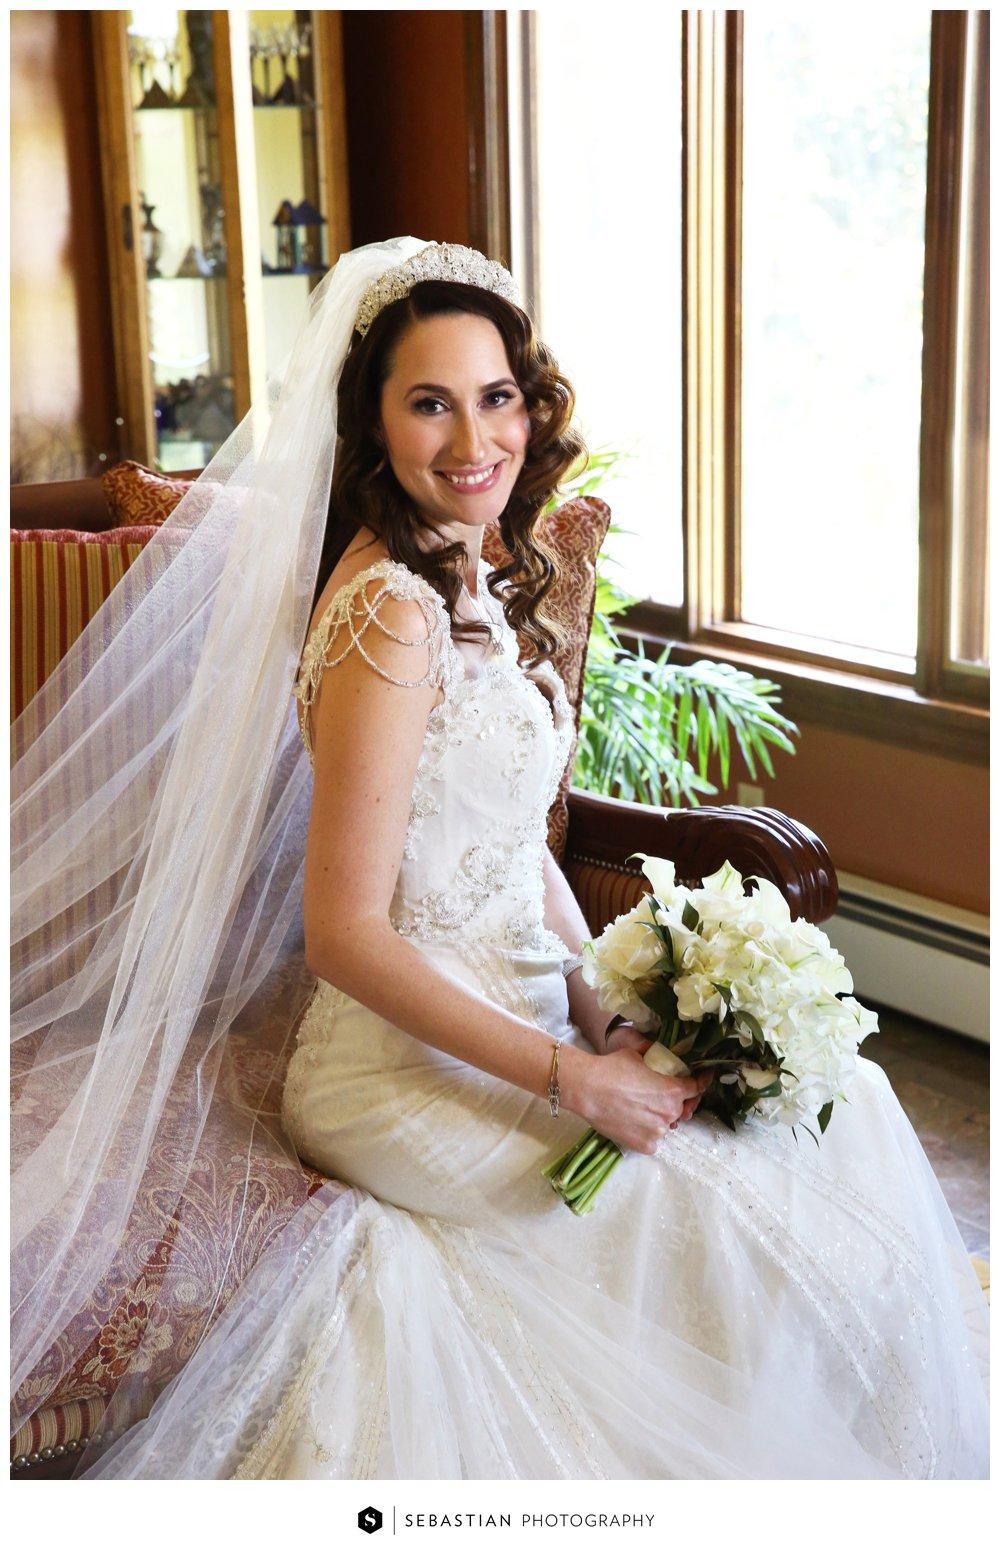 Sebastian Photography_CT Wedding Photographer_Water's Edge_Costal Wedding_CT Shoreline Wedding_7014.jpg